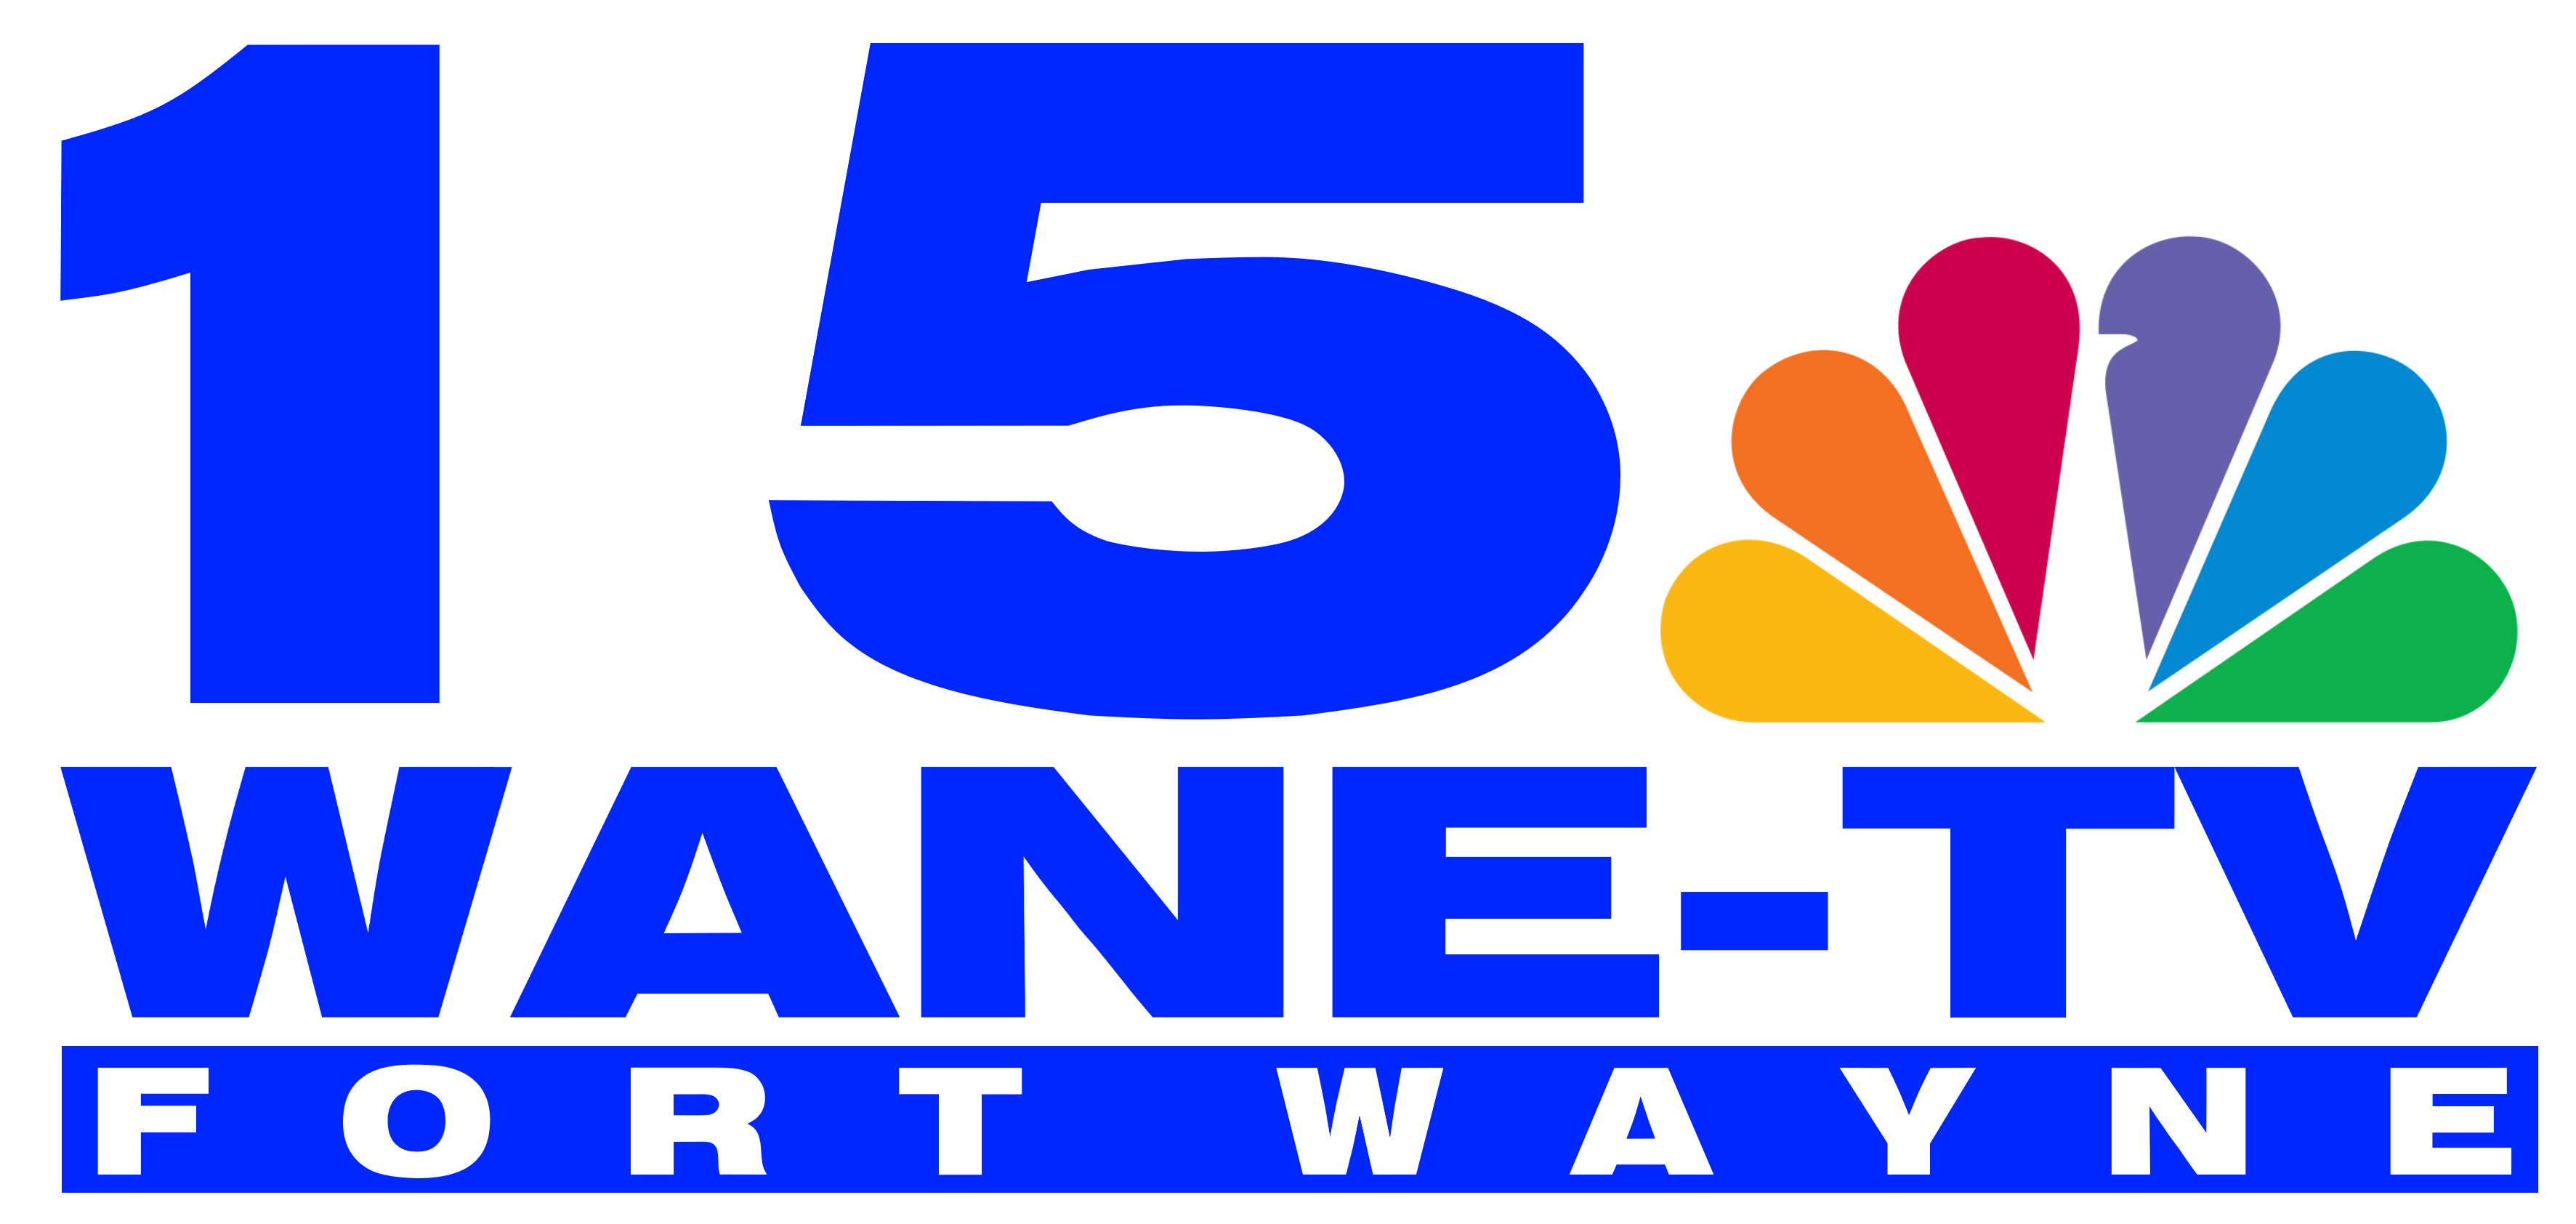 AlternateHistory.com's WANE-TV logo #1.png